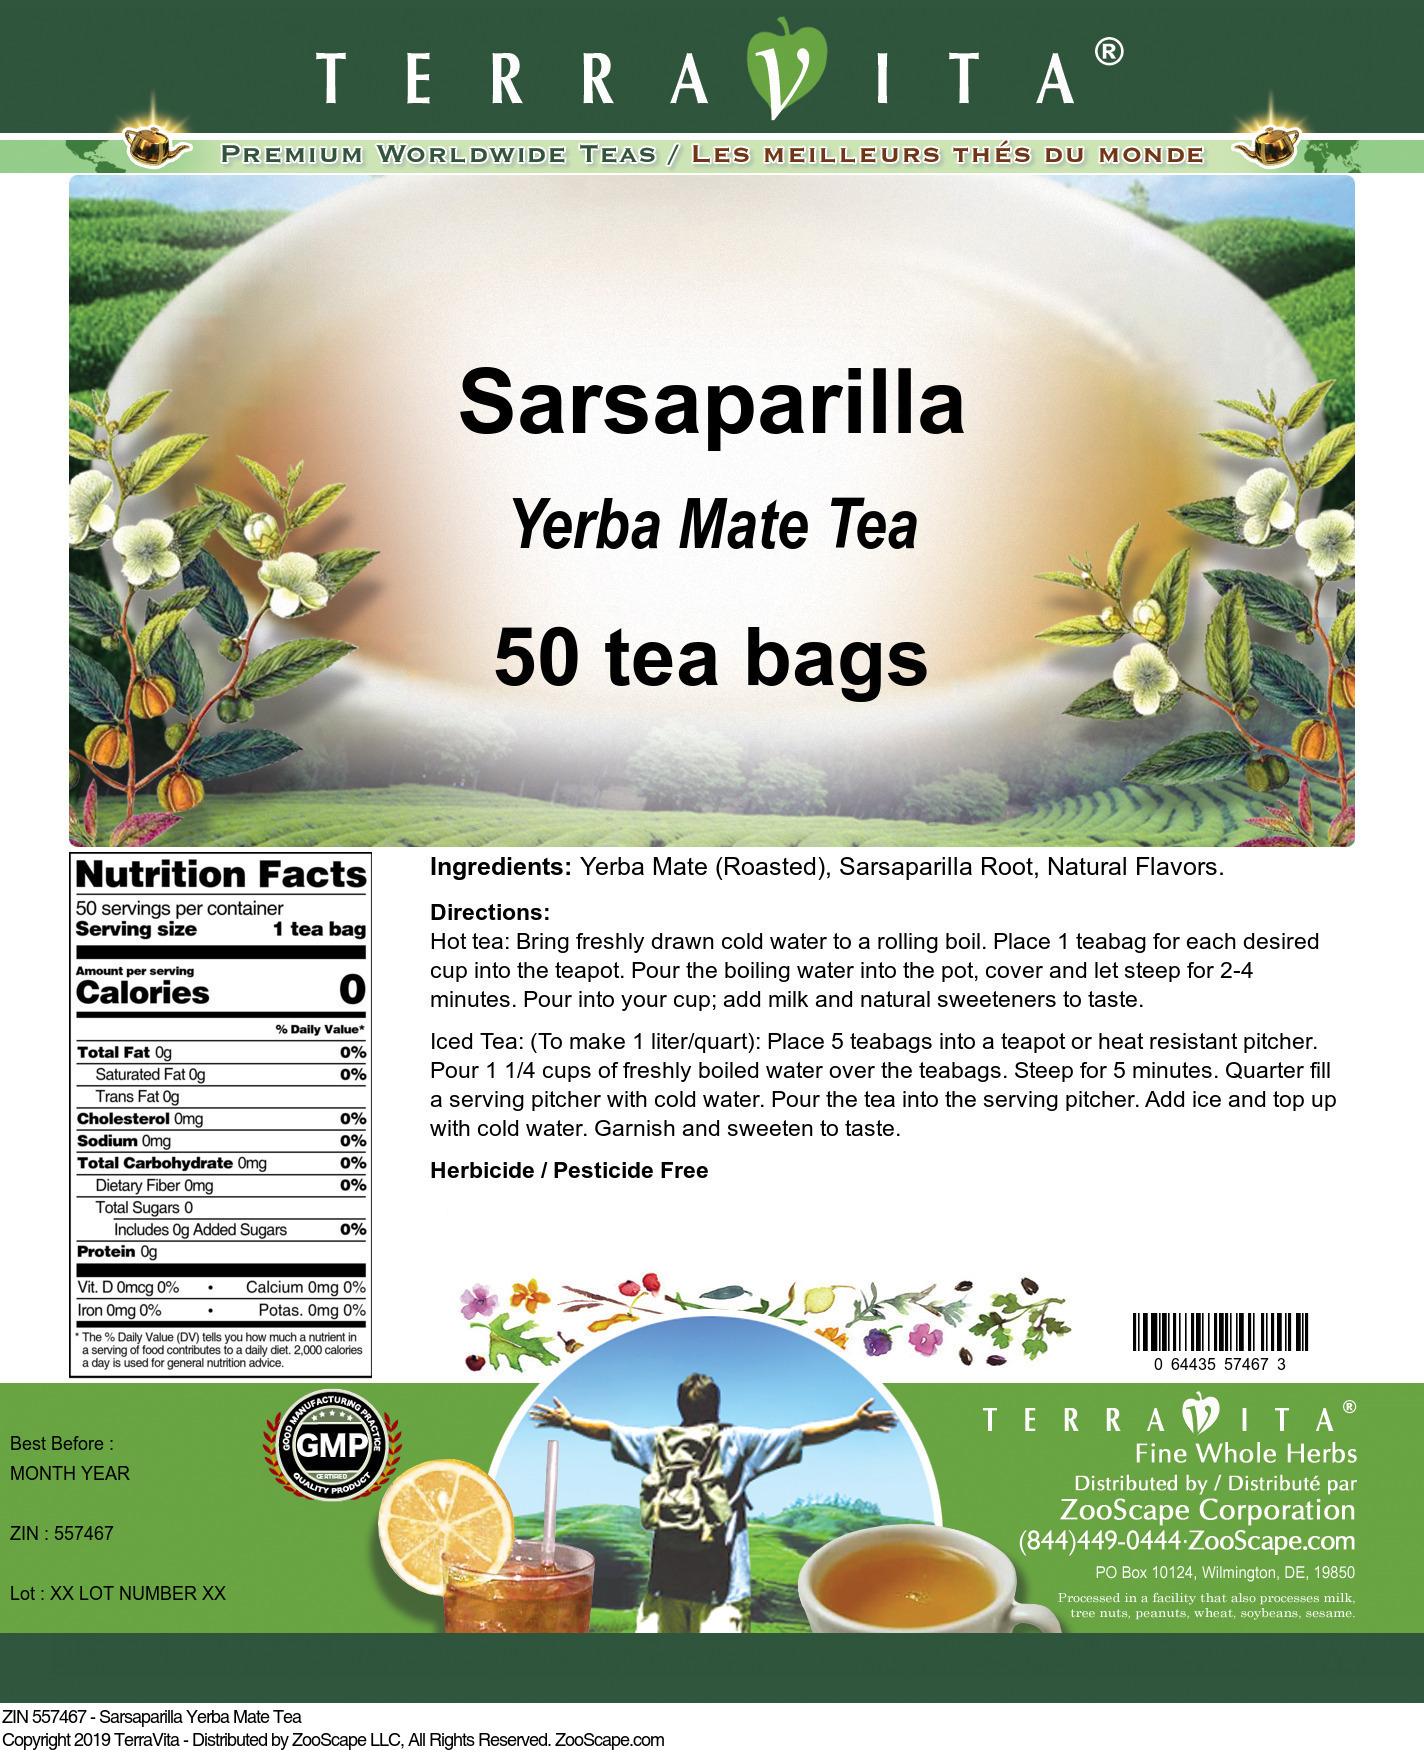 Sarsaparilla Yerba Mate Tea